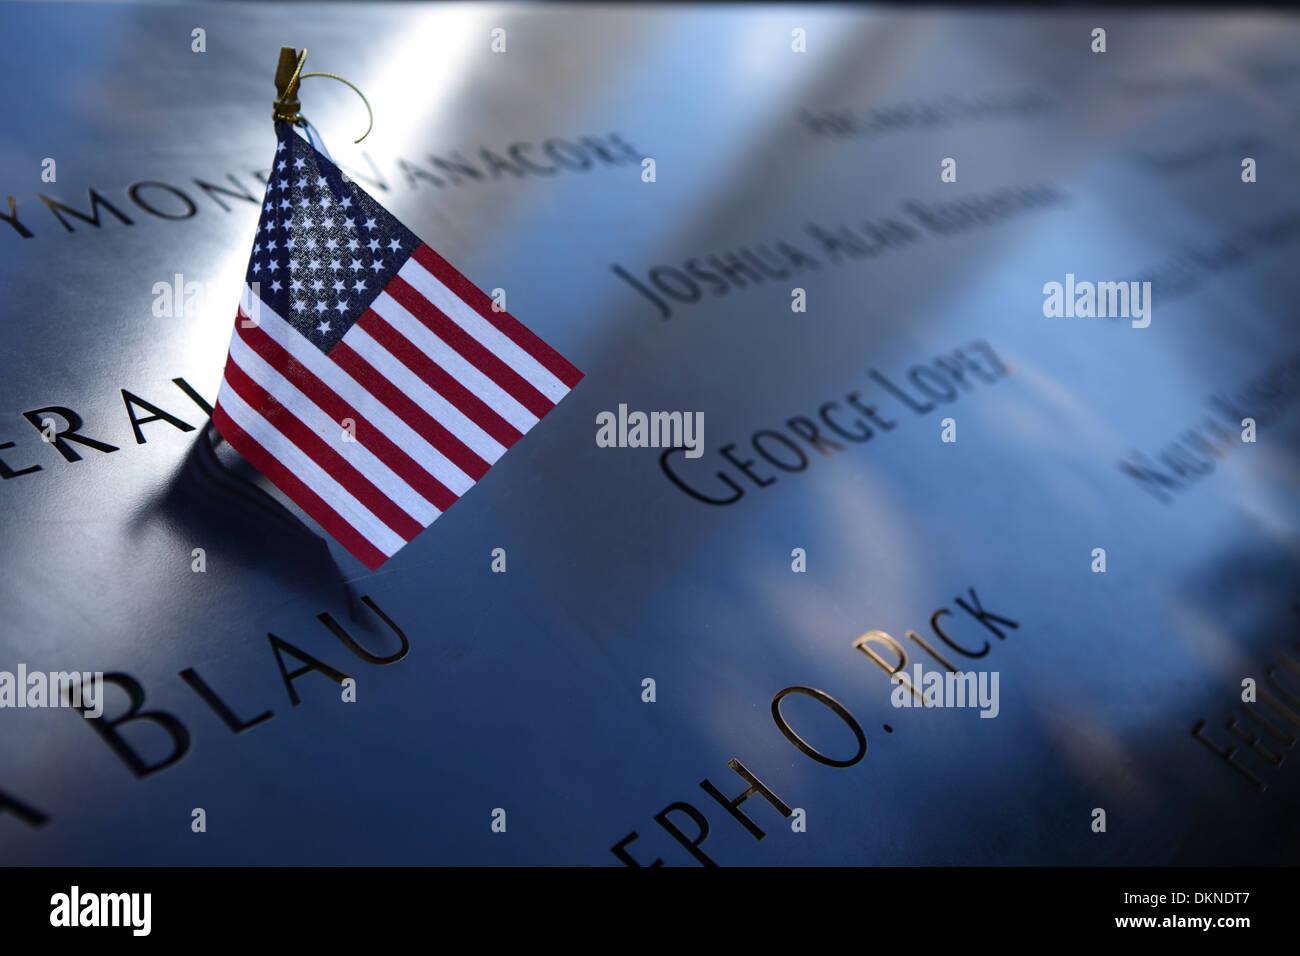 Inscription at September 11 Memorial, New York City, USA - Stock Image